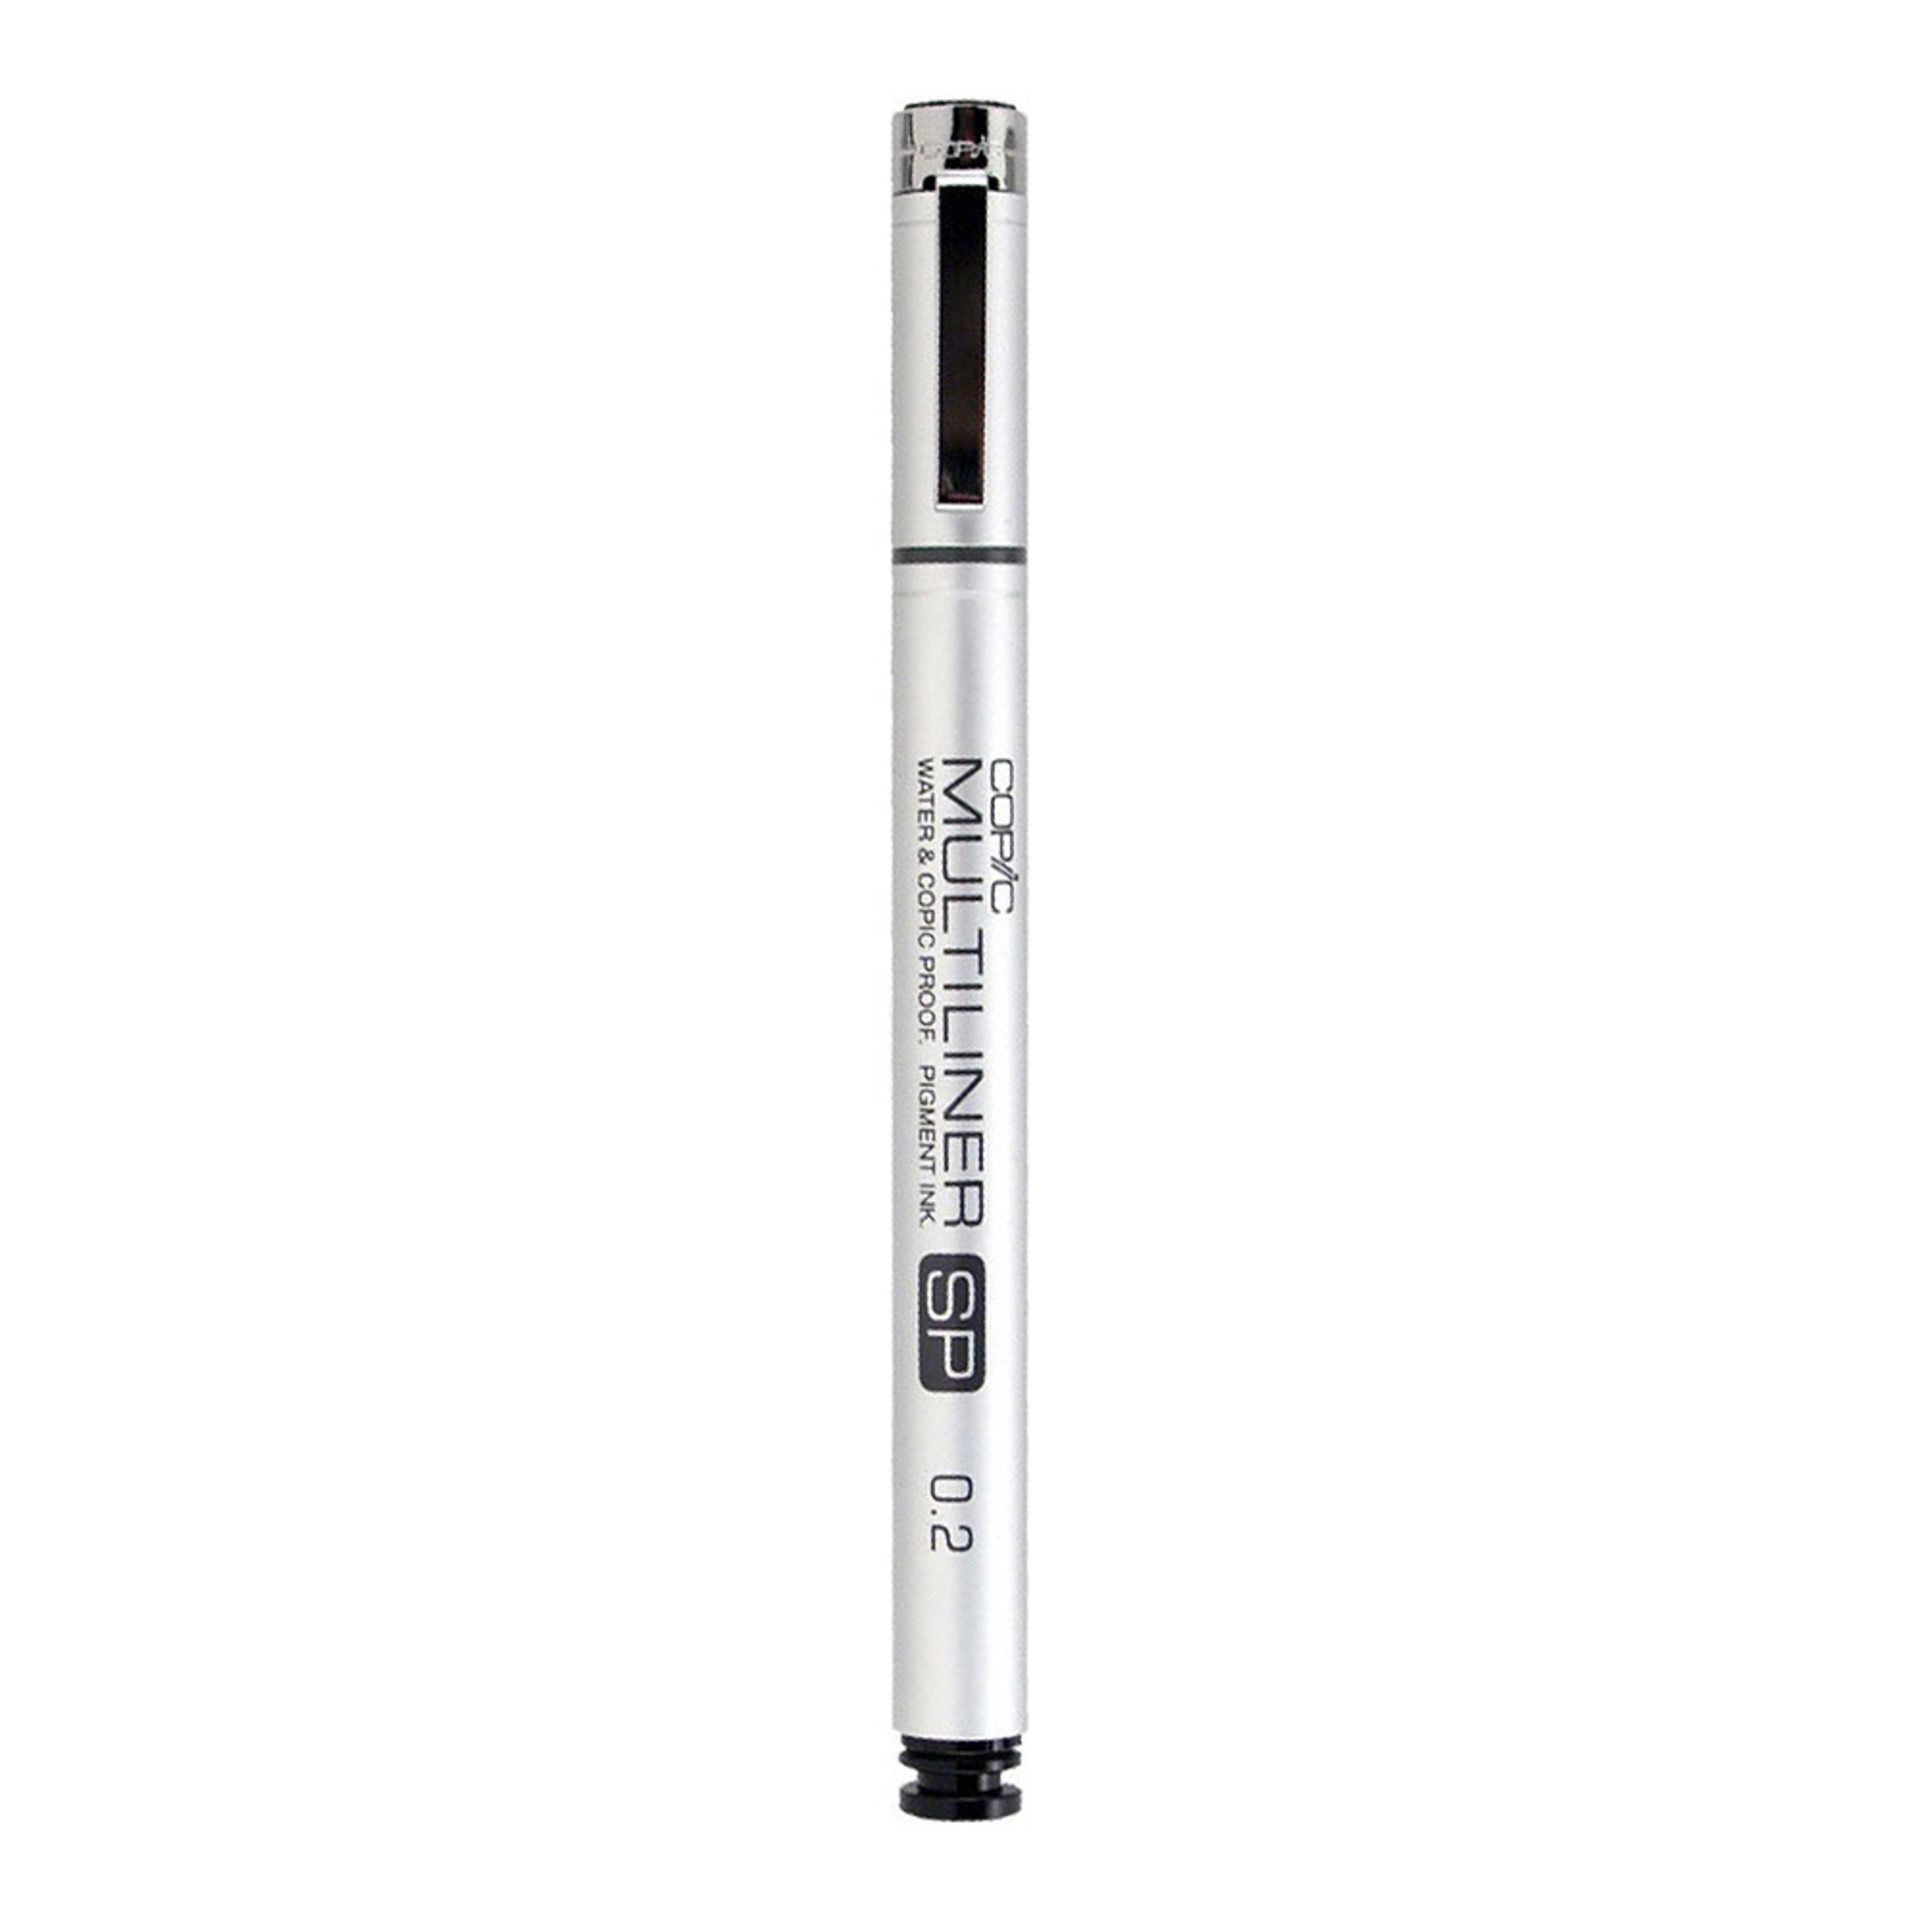 Copic Multiliner SP Pen .2mm Black